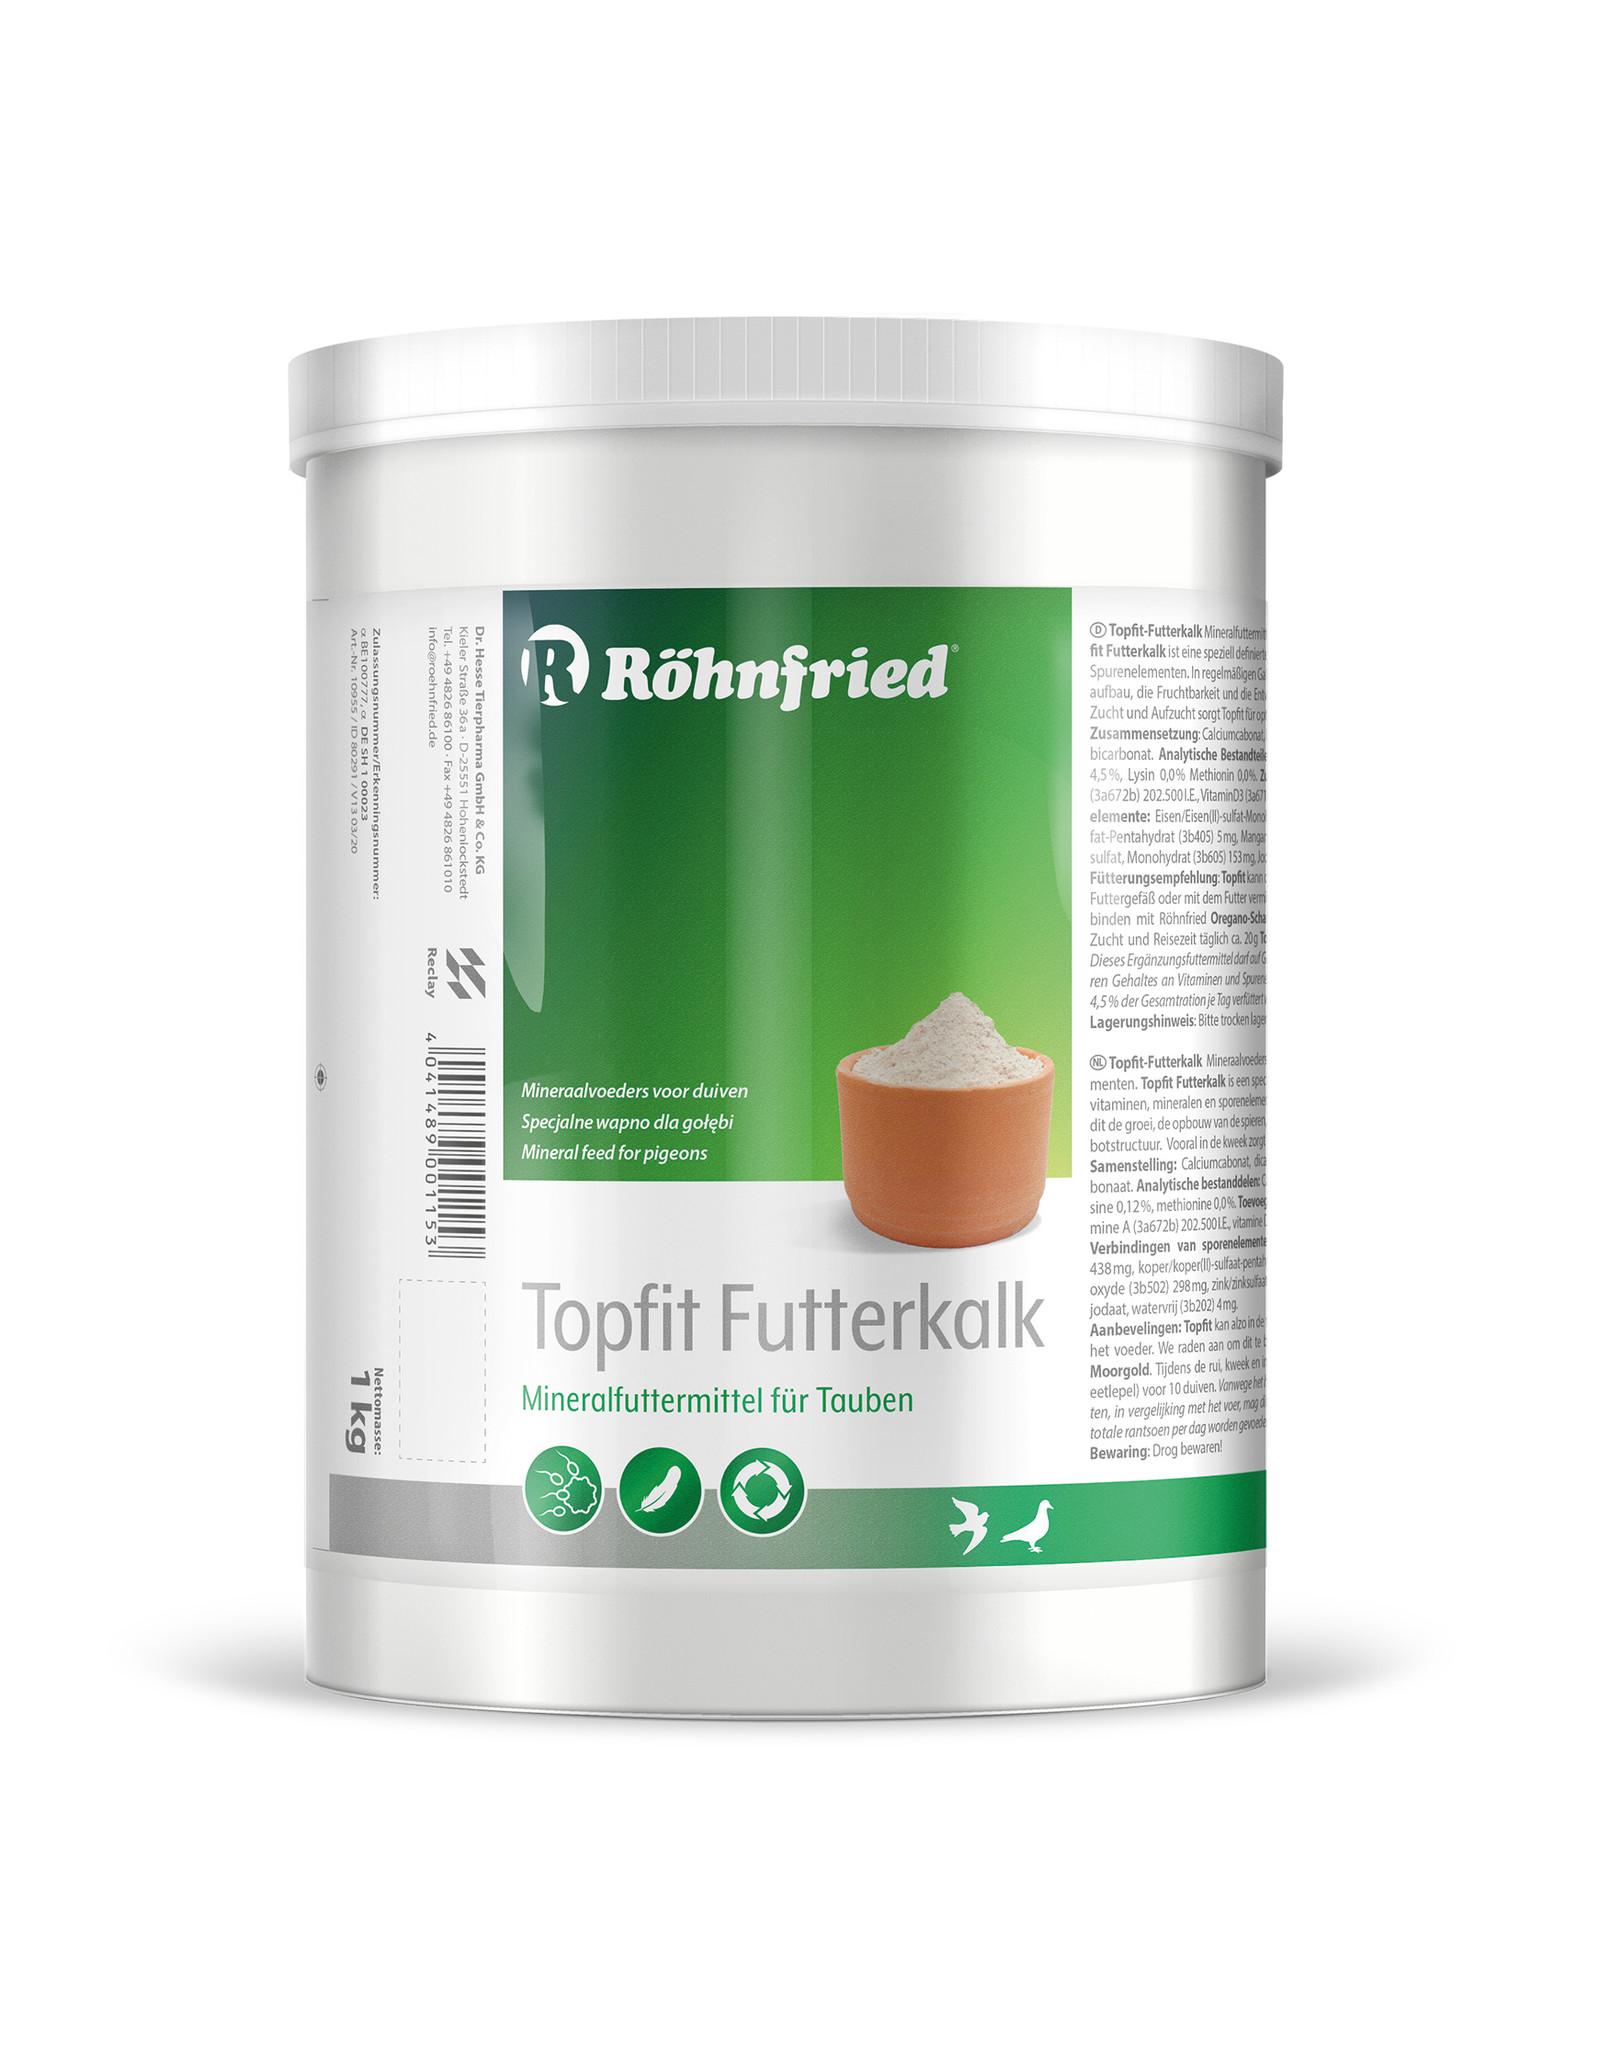 Röhnfried Topfit Futterkalk - 1 KG